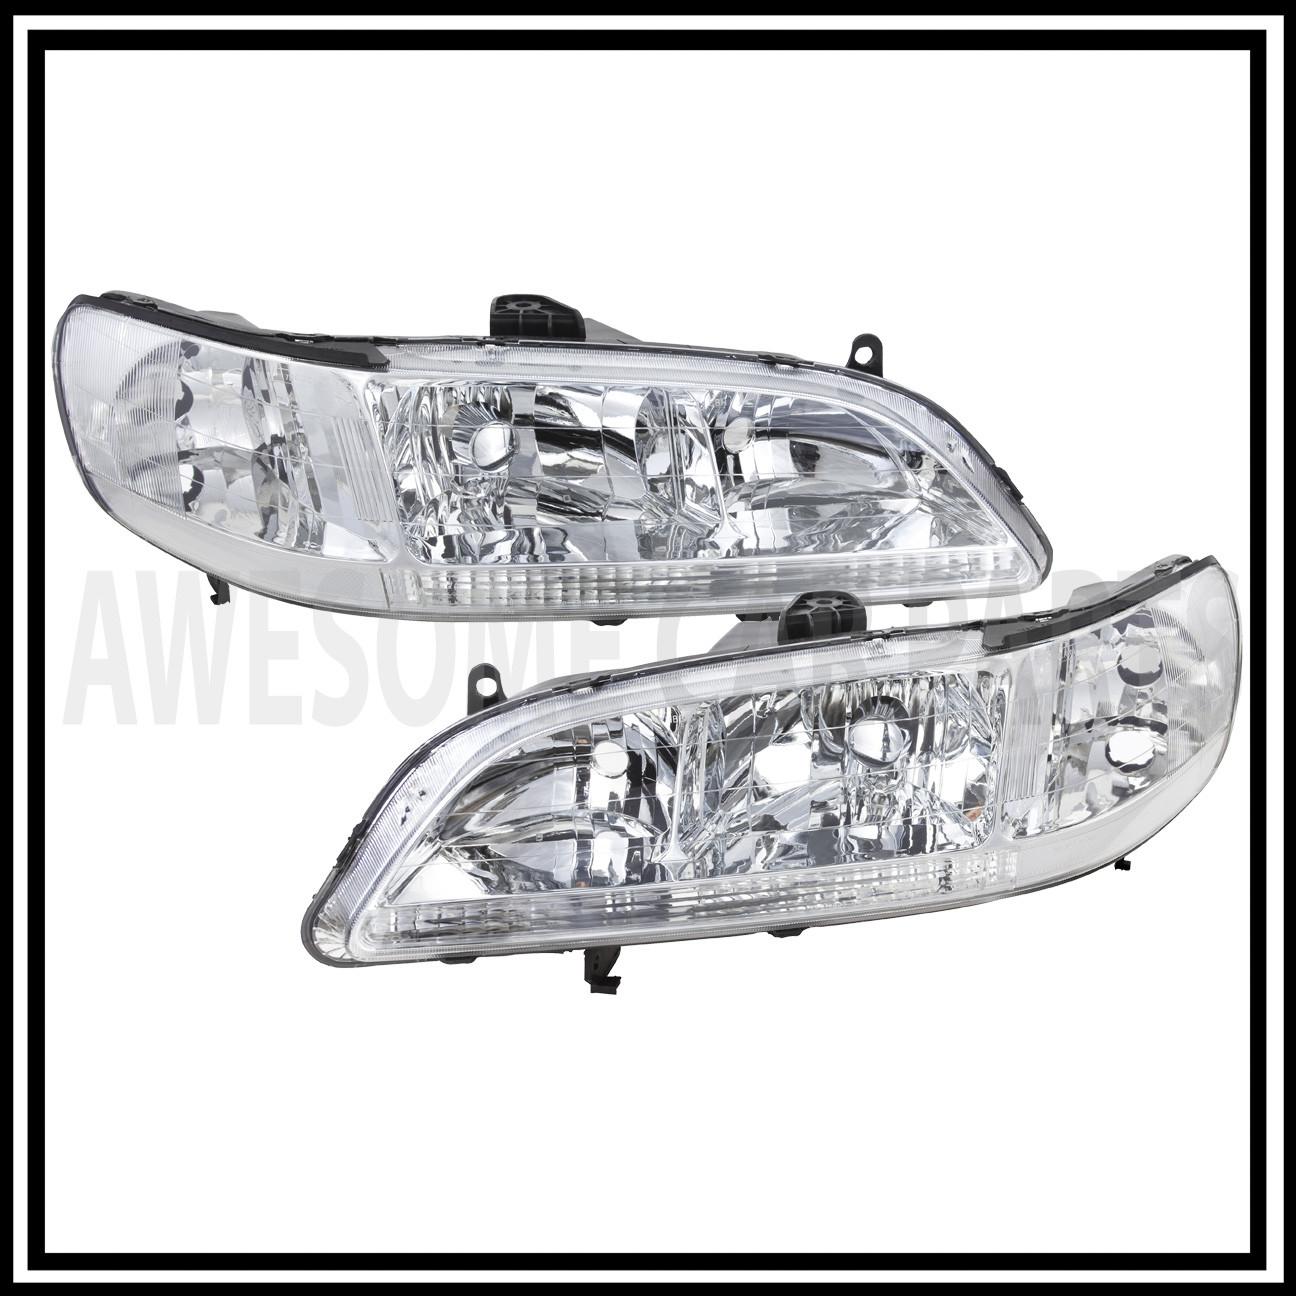 Euro Chrome Housing Clear Lens Headlights Lamp Jdm For 98